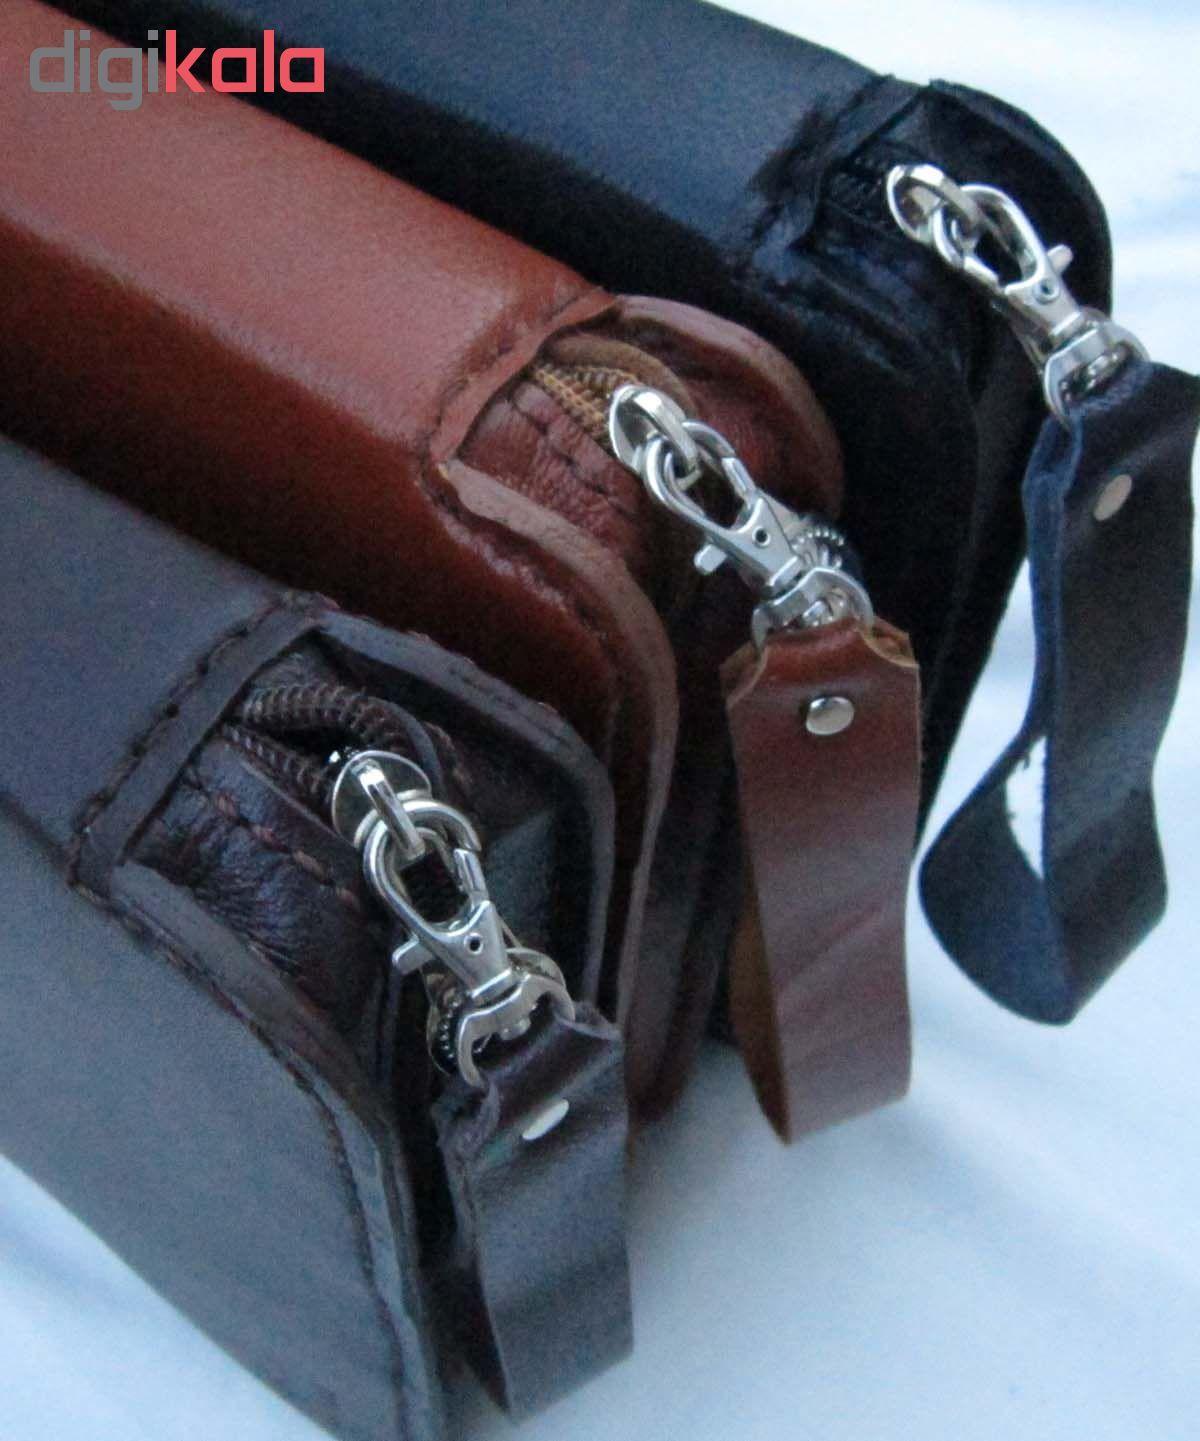 کیف دستی مدیریتی  چرم طبیعی دستدوز مژی مدل MSH main 1 6